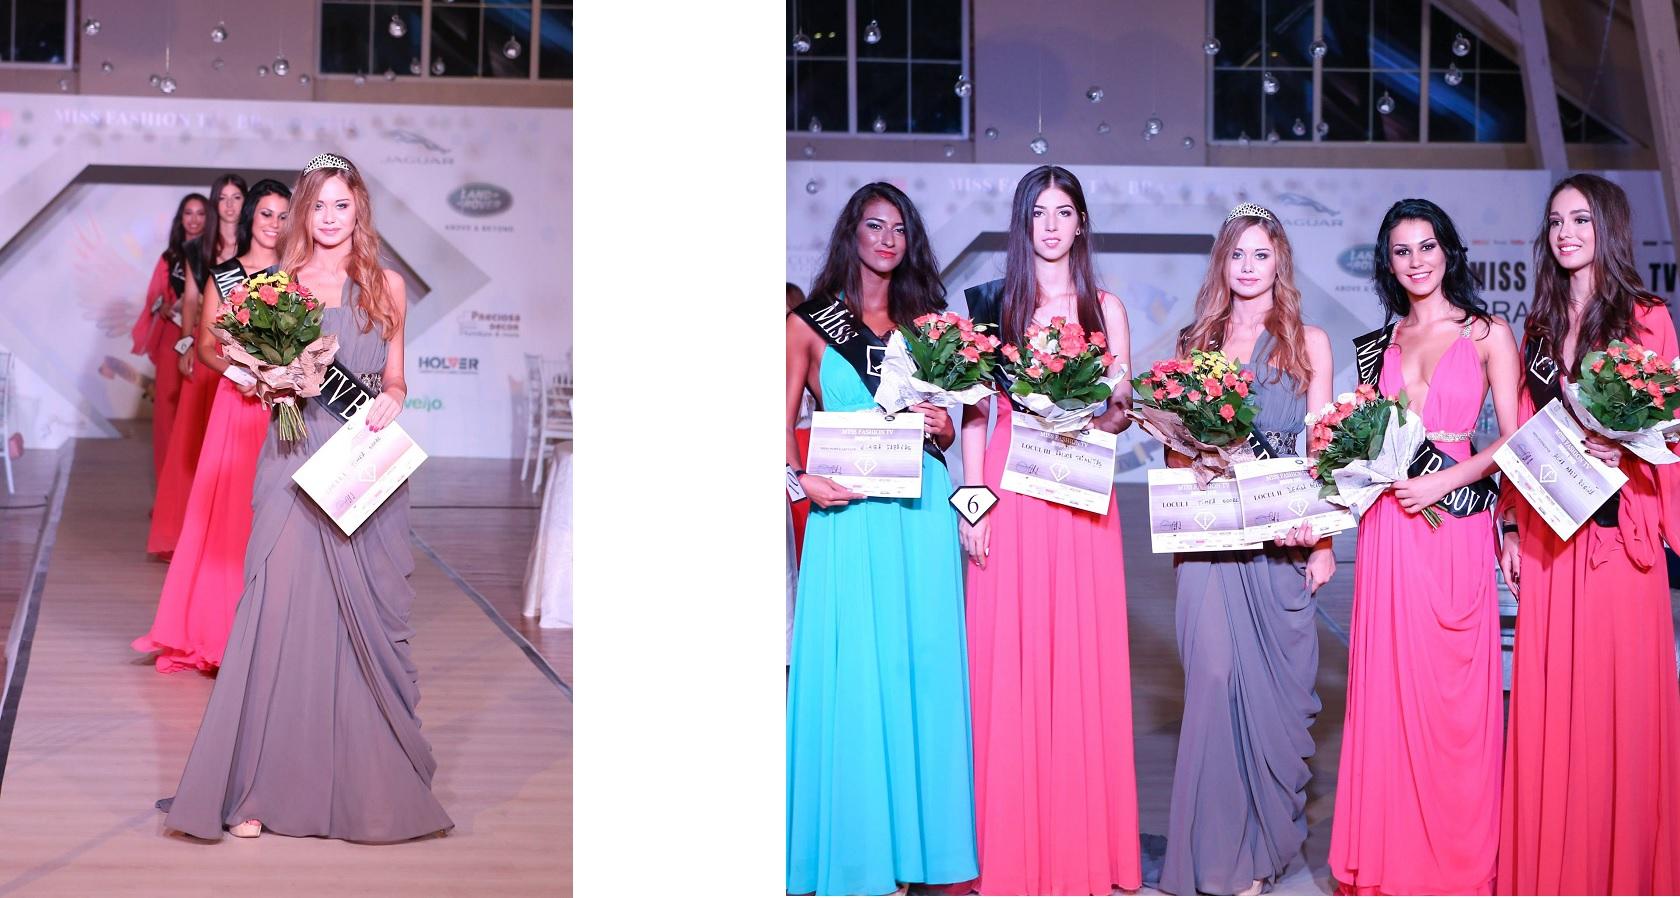 Miss Fashion Tv Brasov 2015